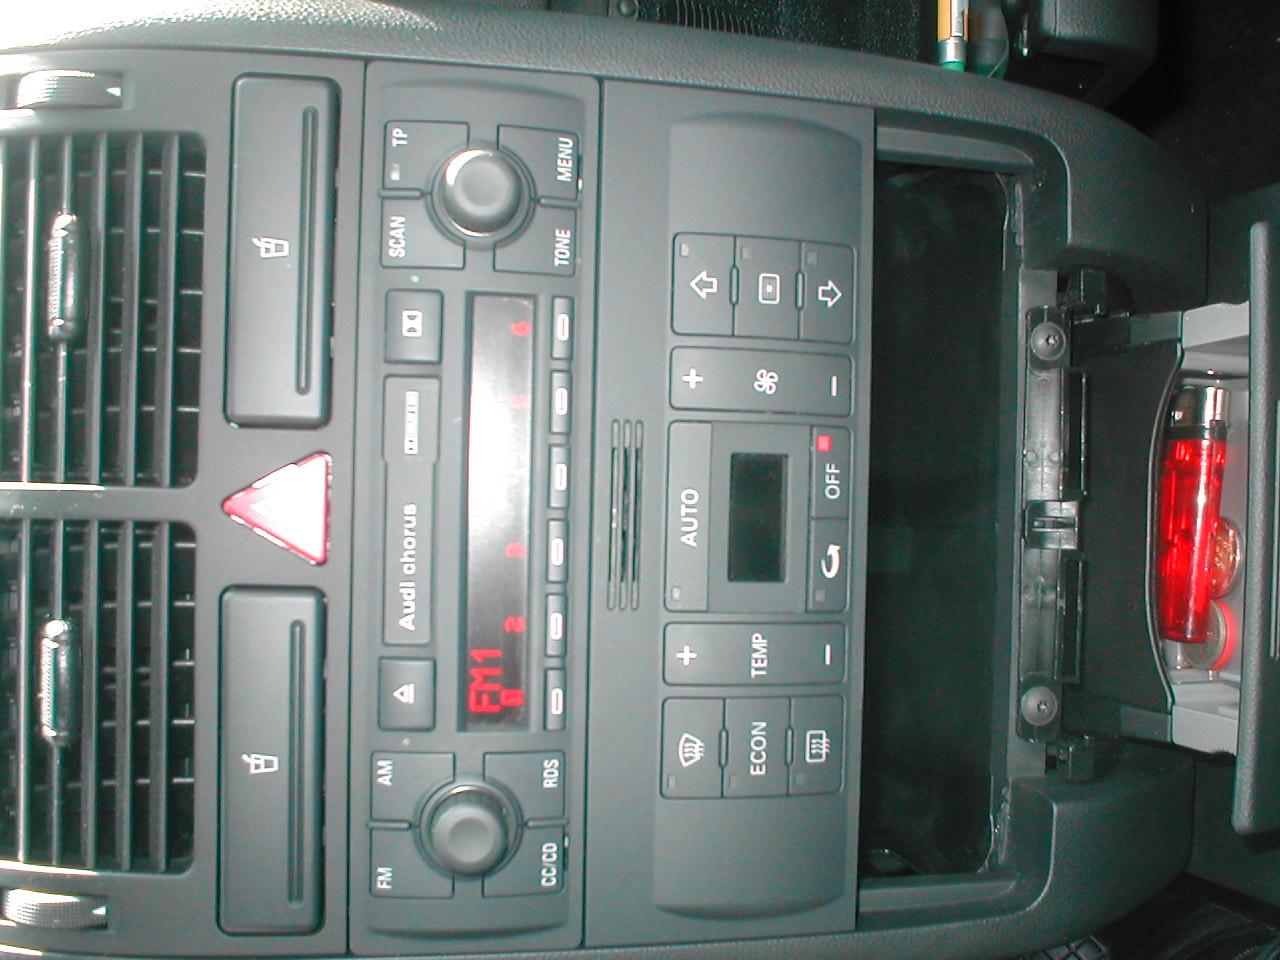 P4060030.JPG.5d189f93424e2c681aaa87db4c0ecacc.JPG